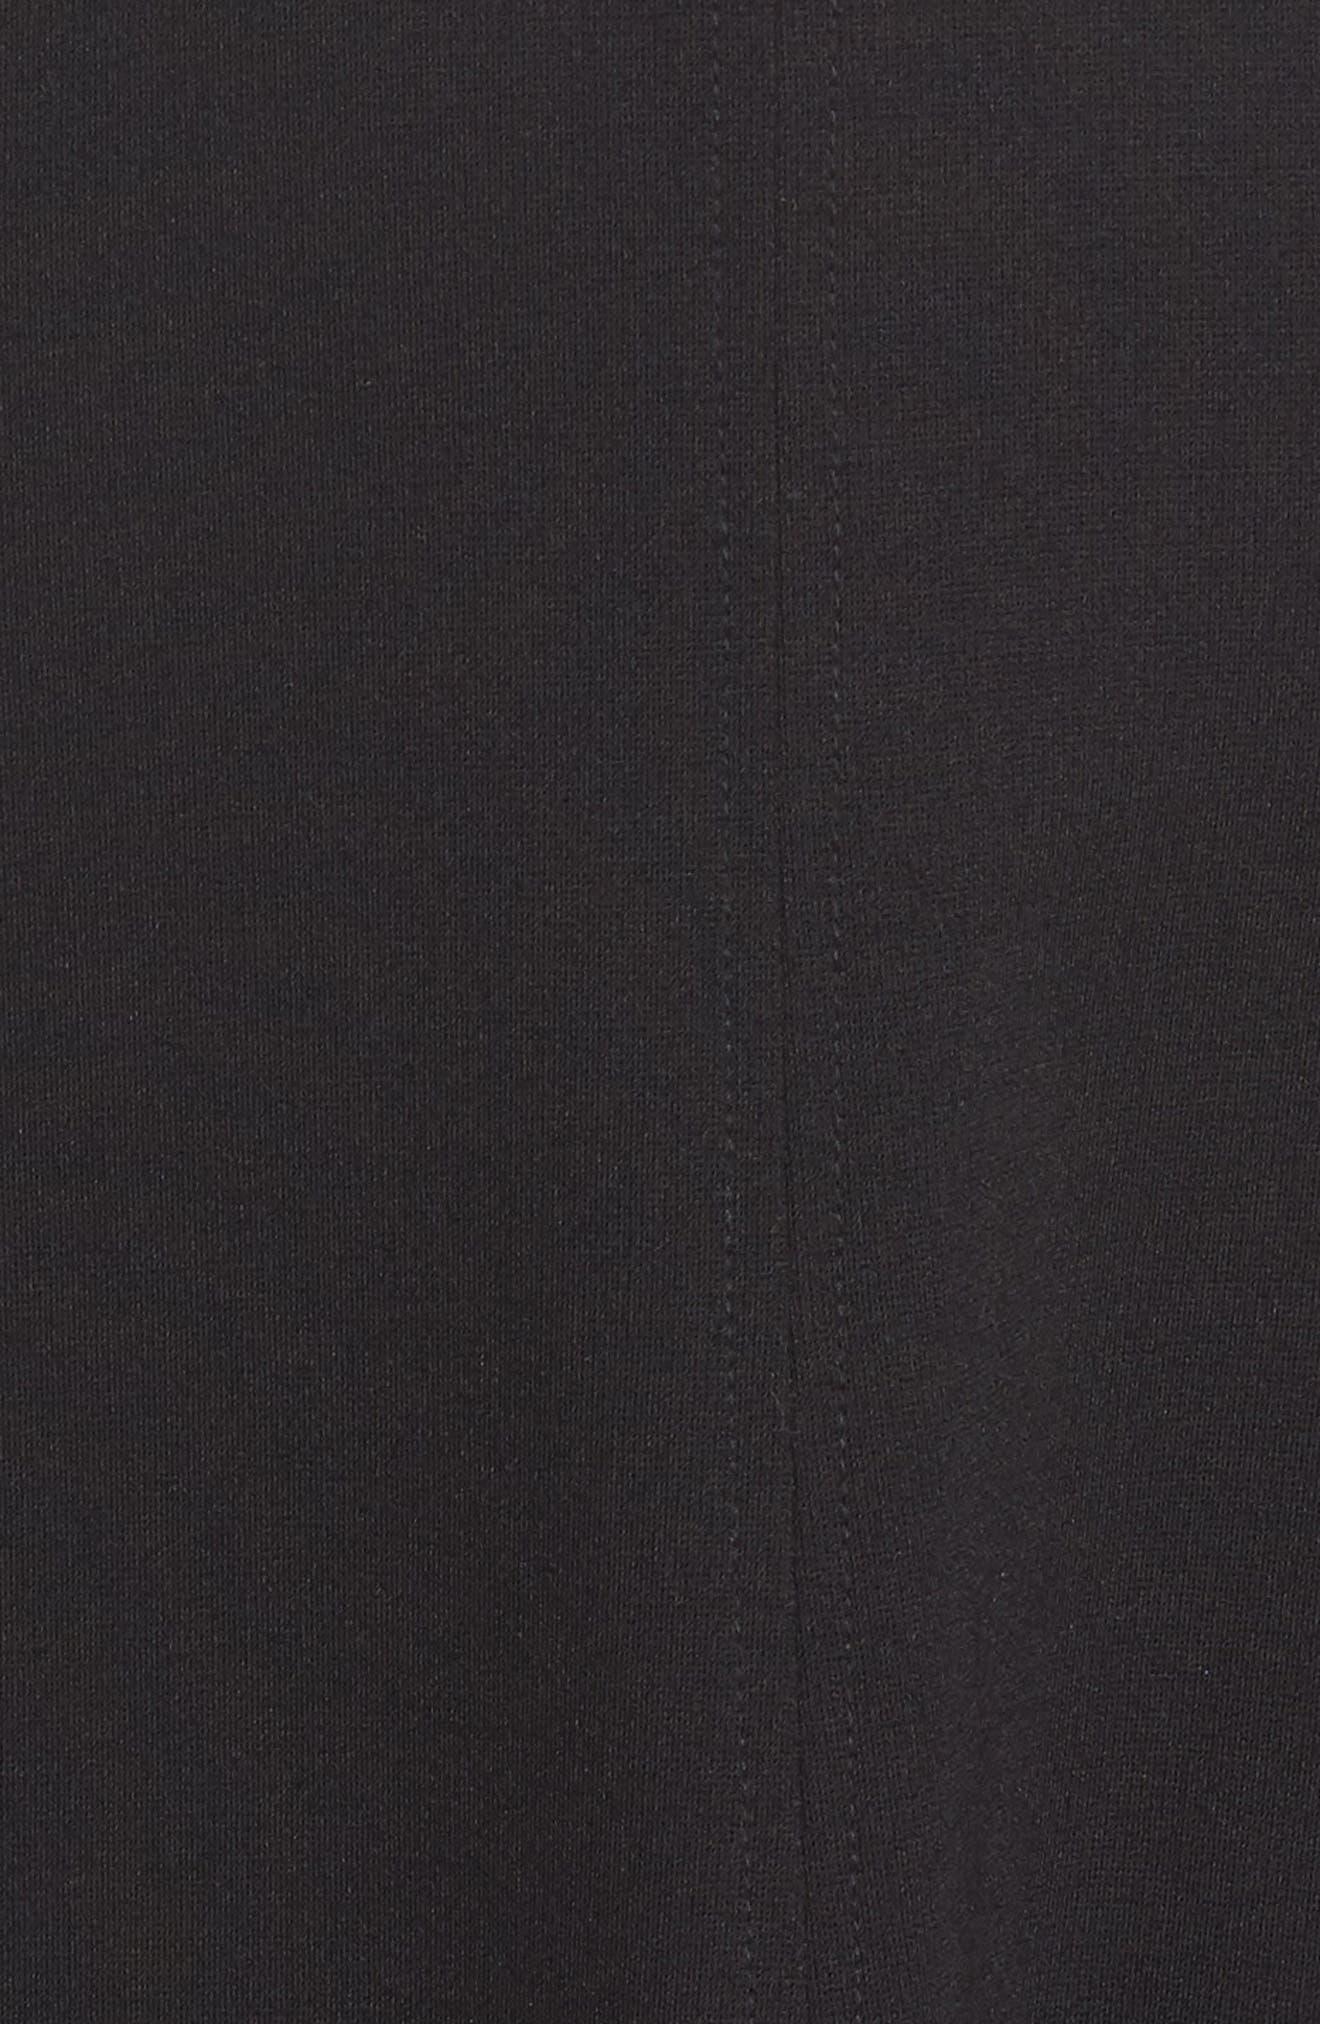 ELIZA J, Seamed Fit & Flare Dress, Alternate thumbnail 6, color, BLACK